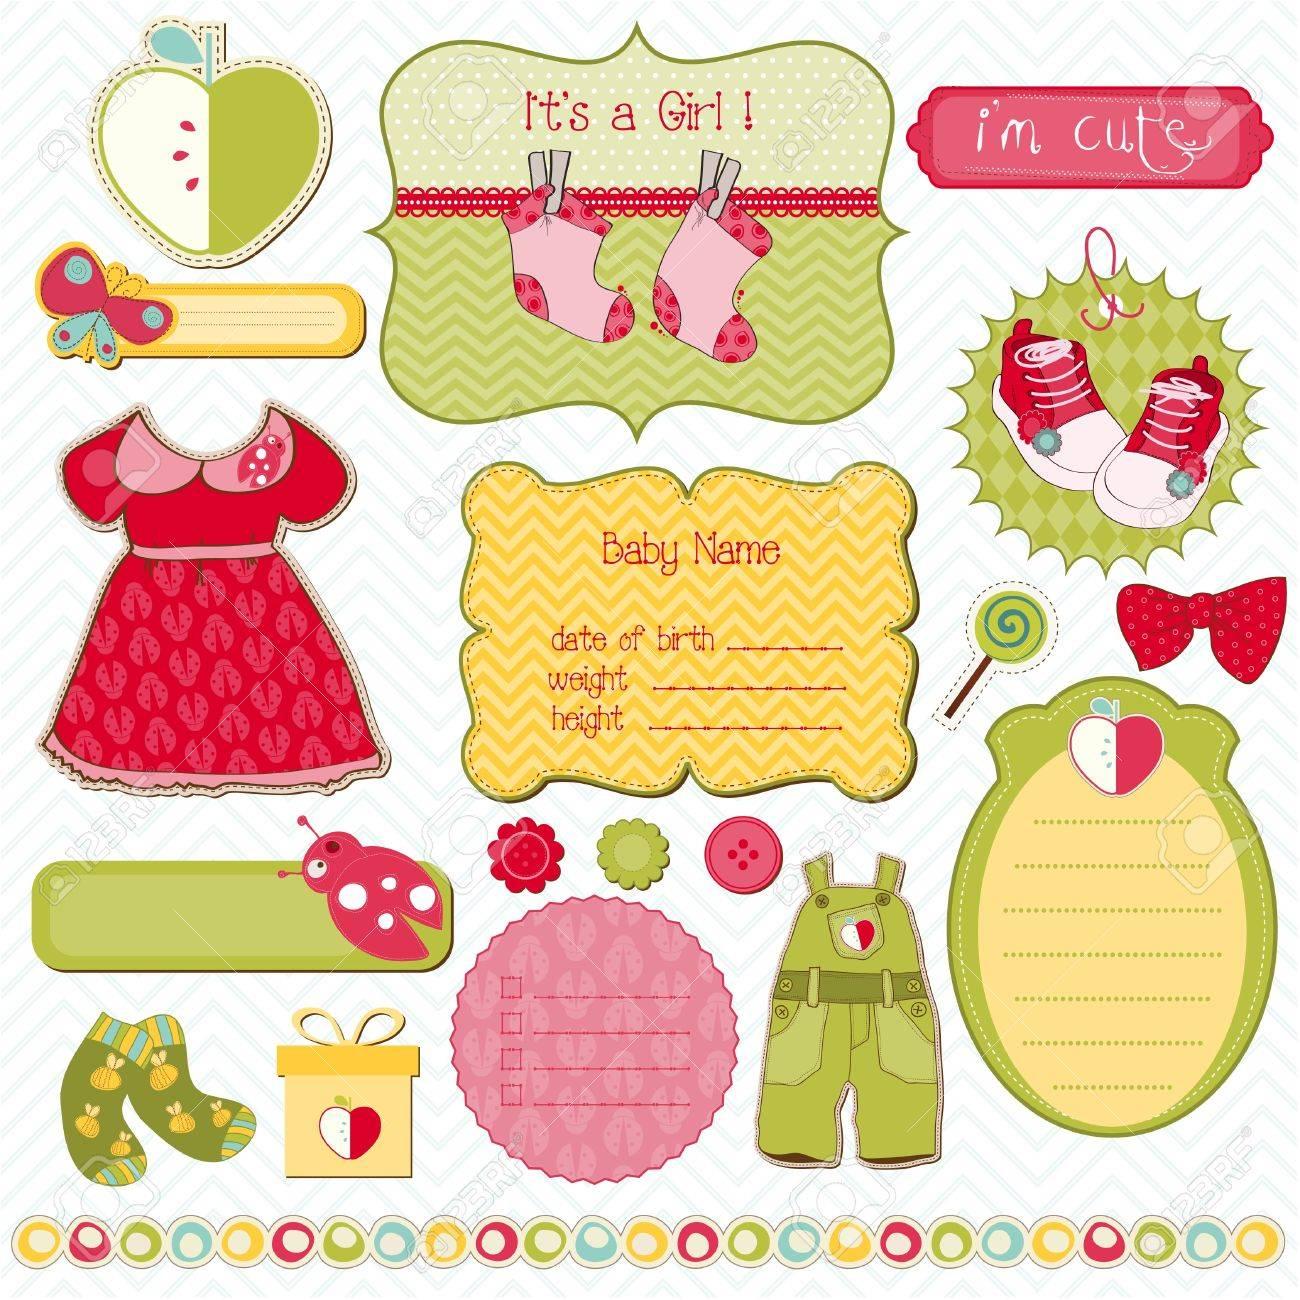 How to scrapbook for baby girl - Design Elements For Baby Scrapbook Easy To Edit Stock Vector 9303525